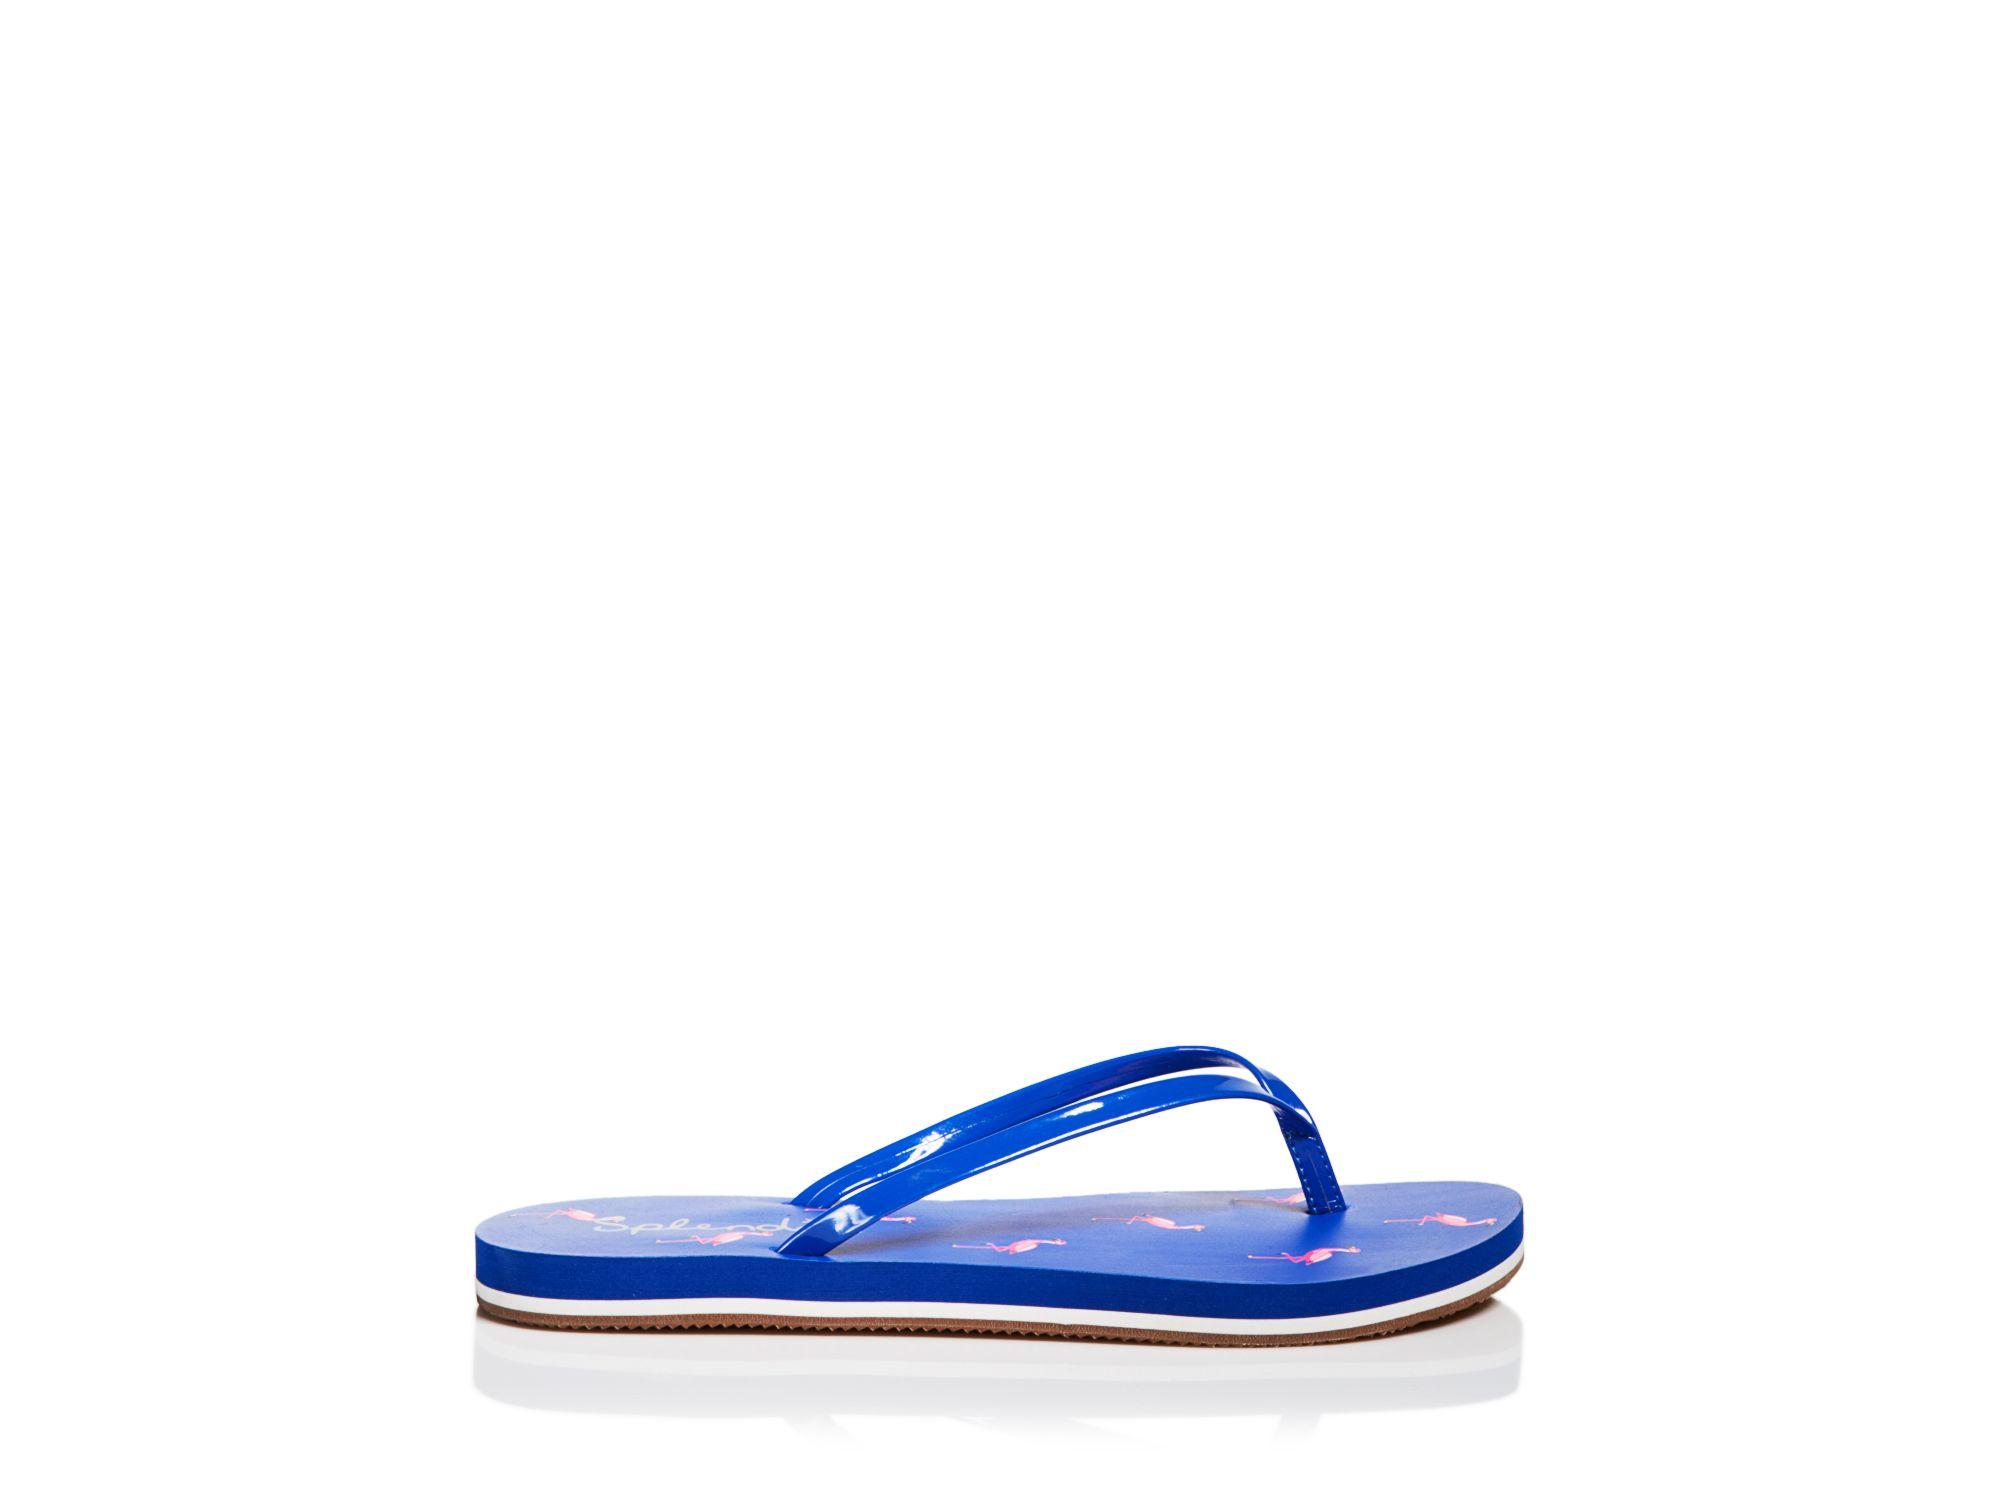 9d5cff0170b Lyst - Splendid Flip Flop Sandals - Firefly Flamingo in Blue